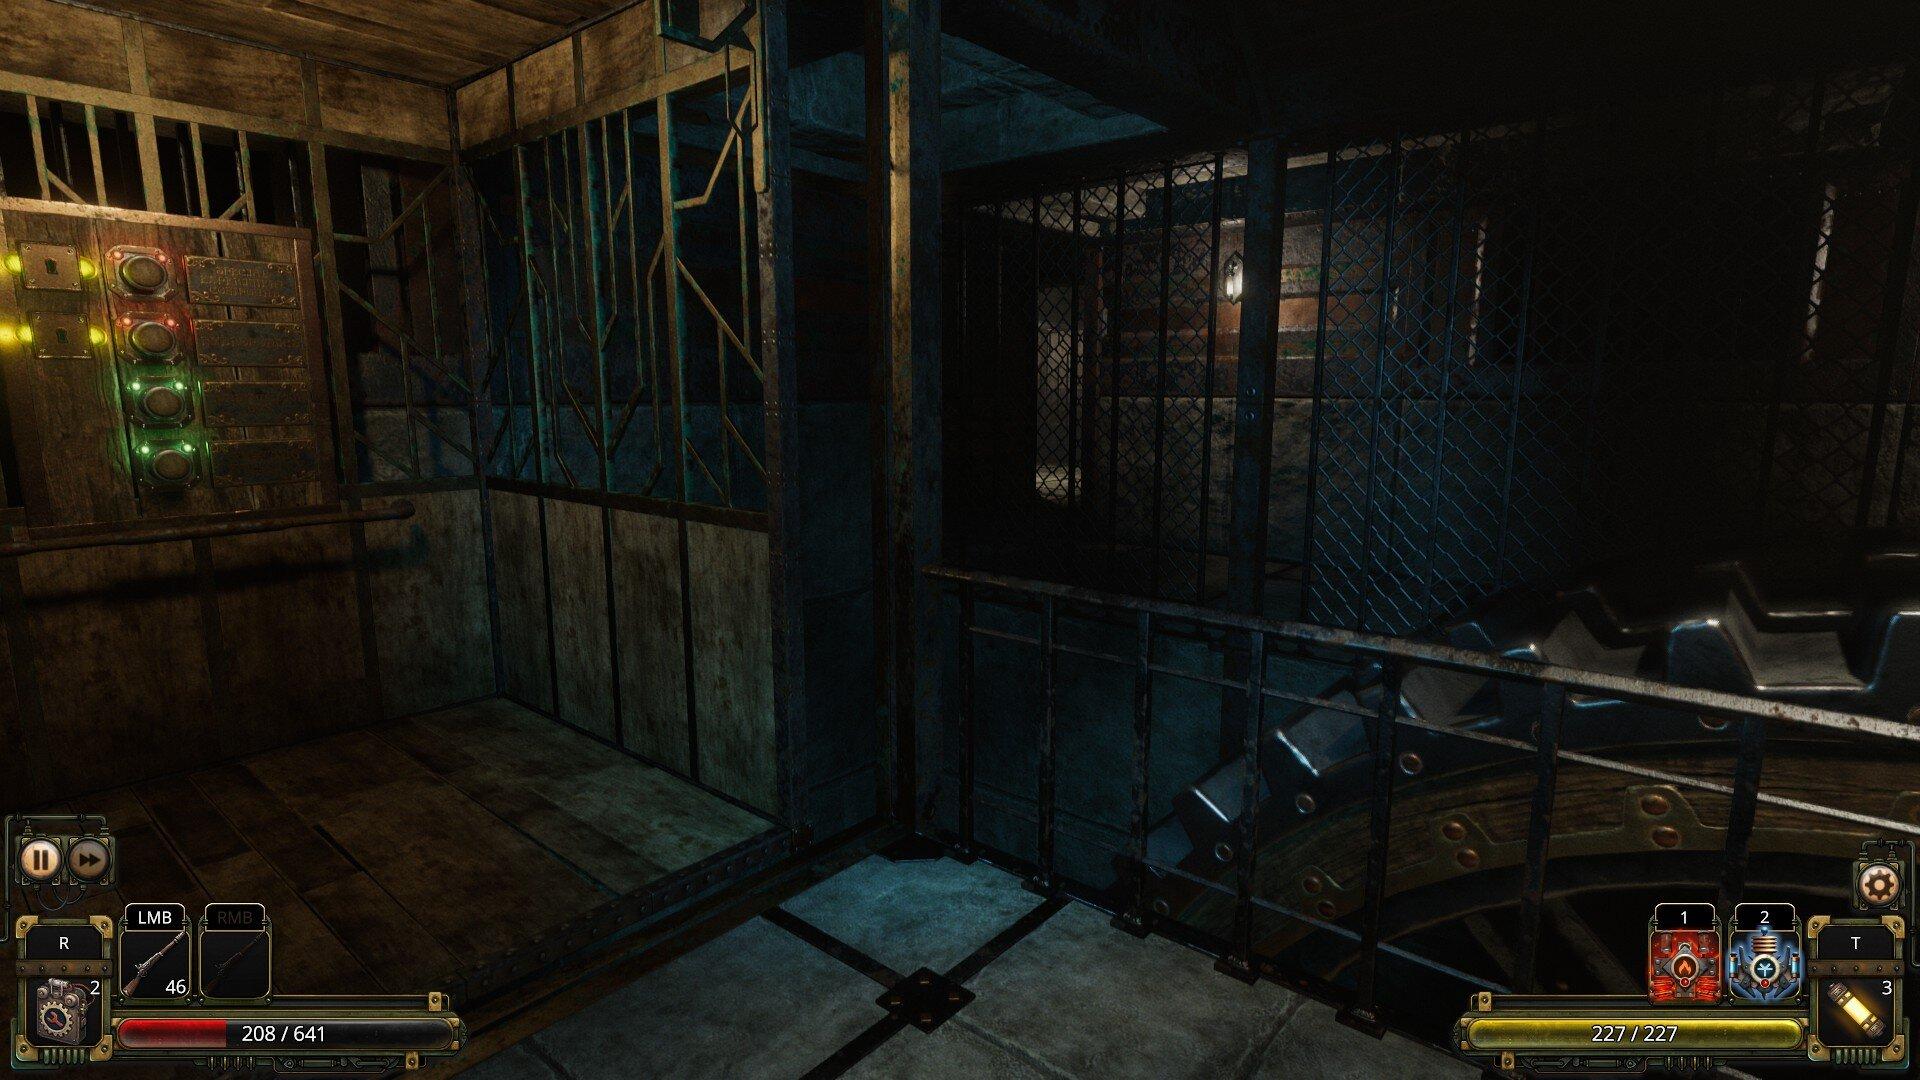 Vaporum: Lockdown game screenshot, steampunk elevator